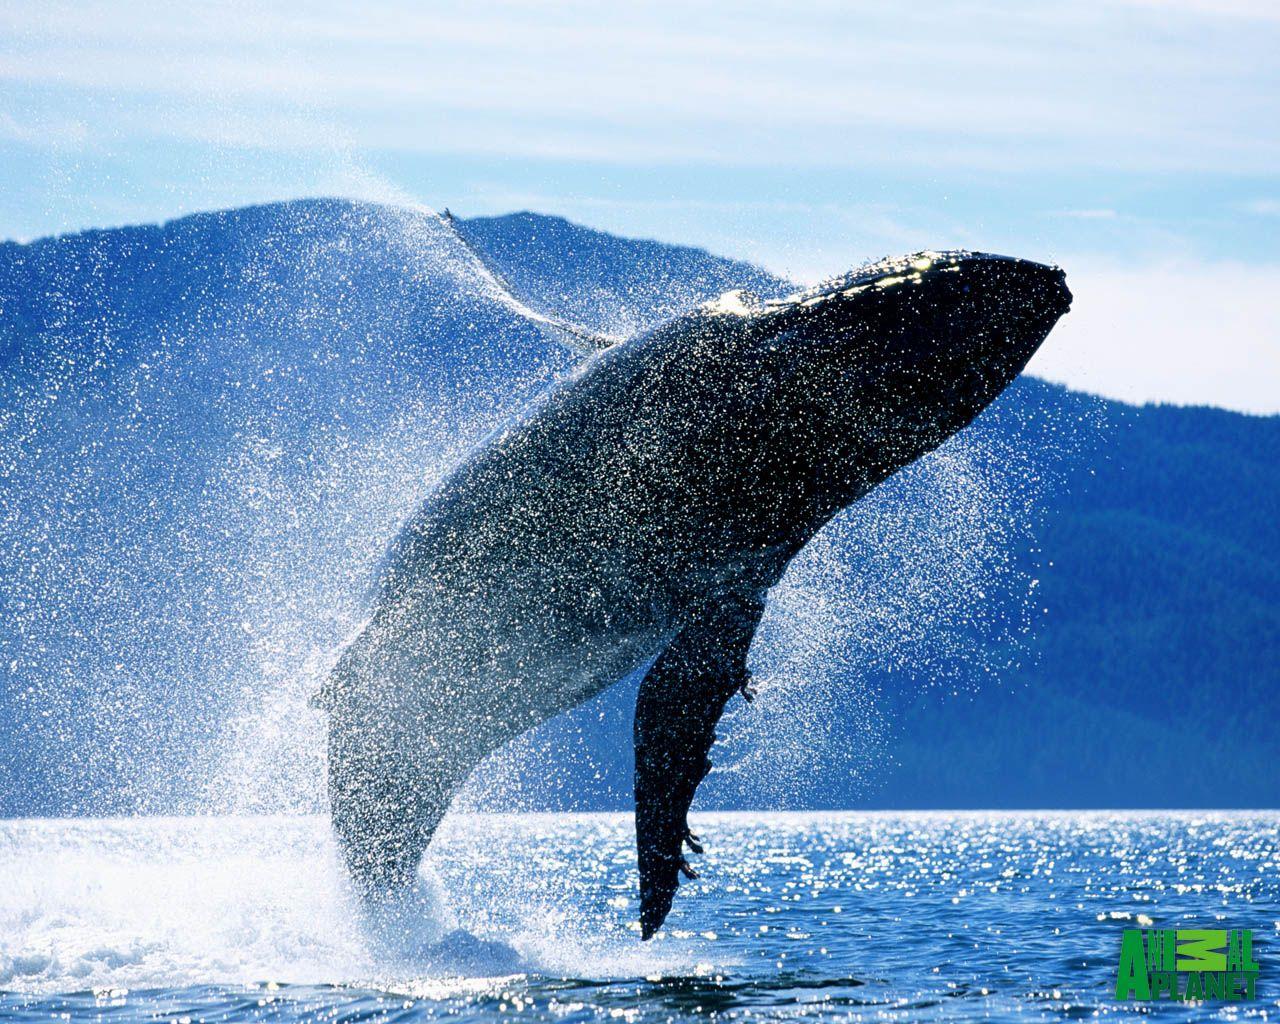 Humback Whale Breaching Whale Blue Whale Humpback Whale